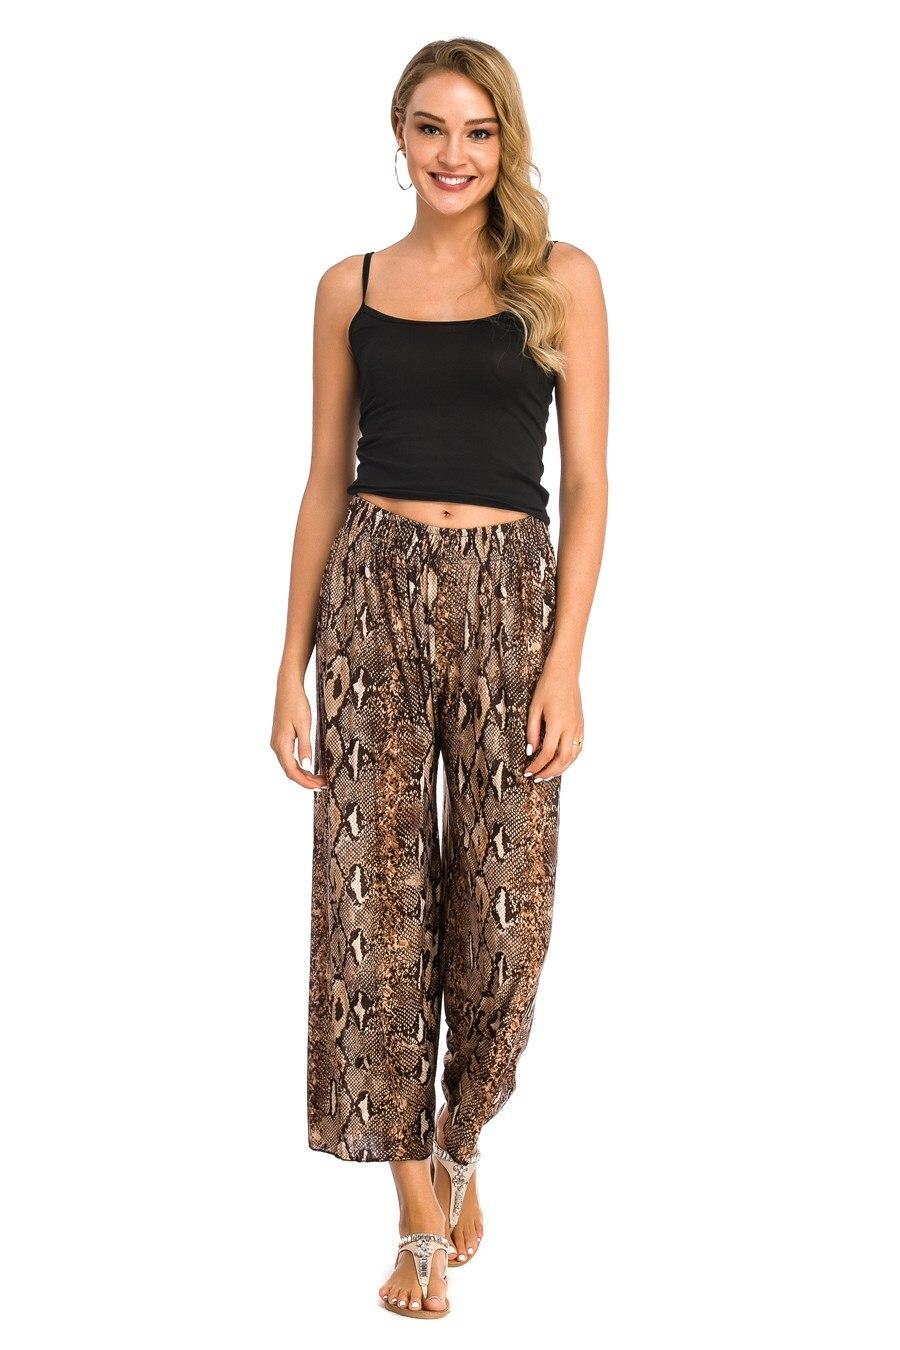 Women Leisure High Elastic Waist   Pants   Snake Skin Female Casual   Wide     Leg     Pants   Summer High Waist Loose Print   Pants